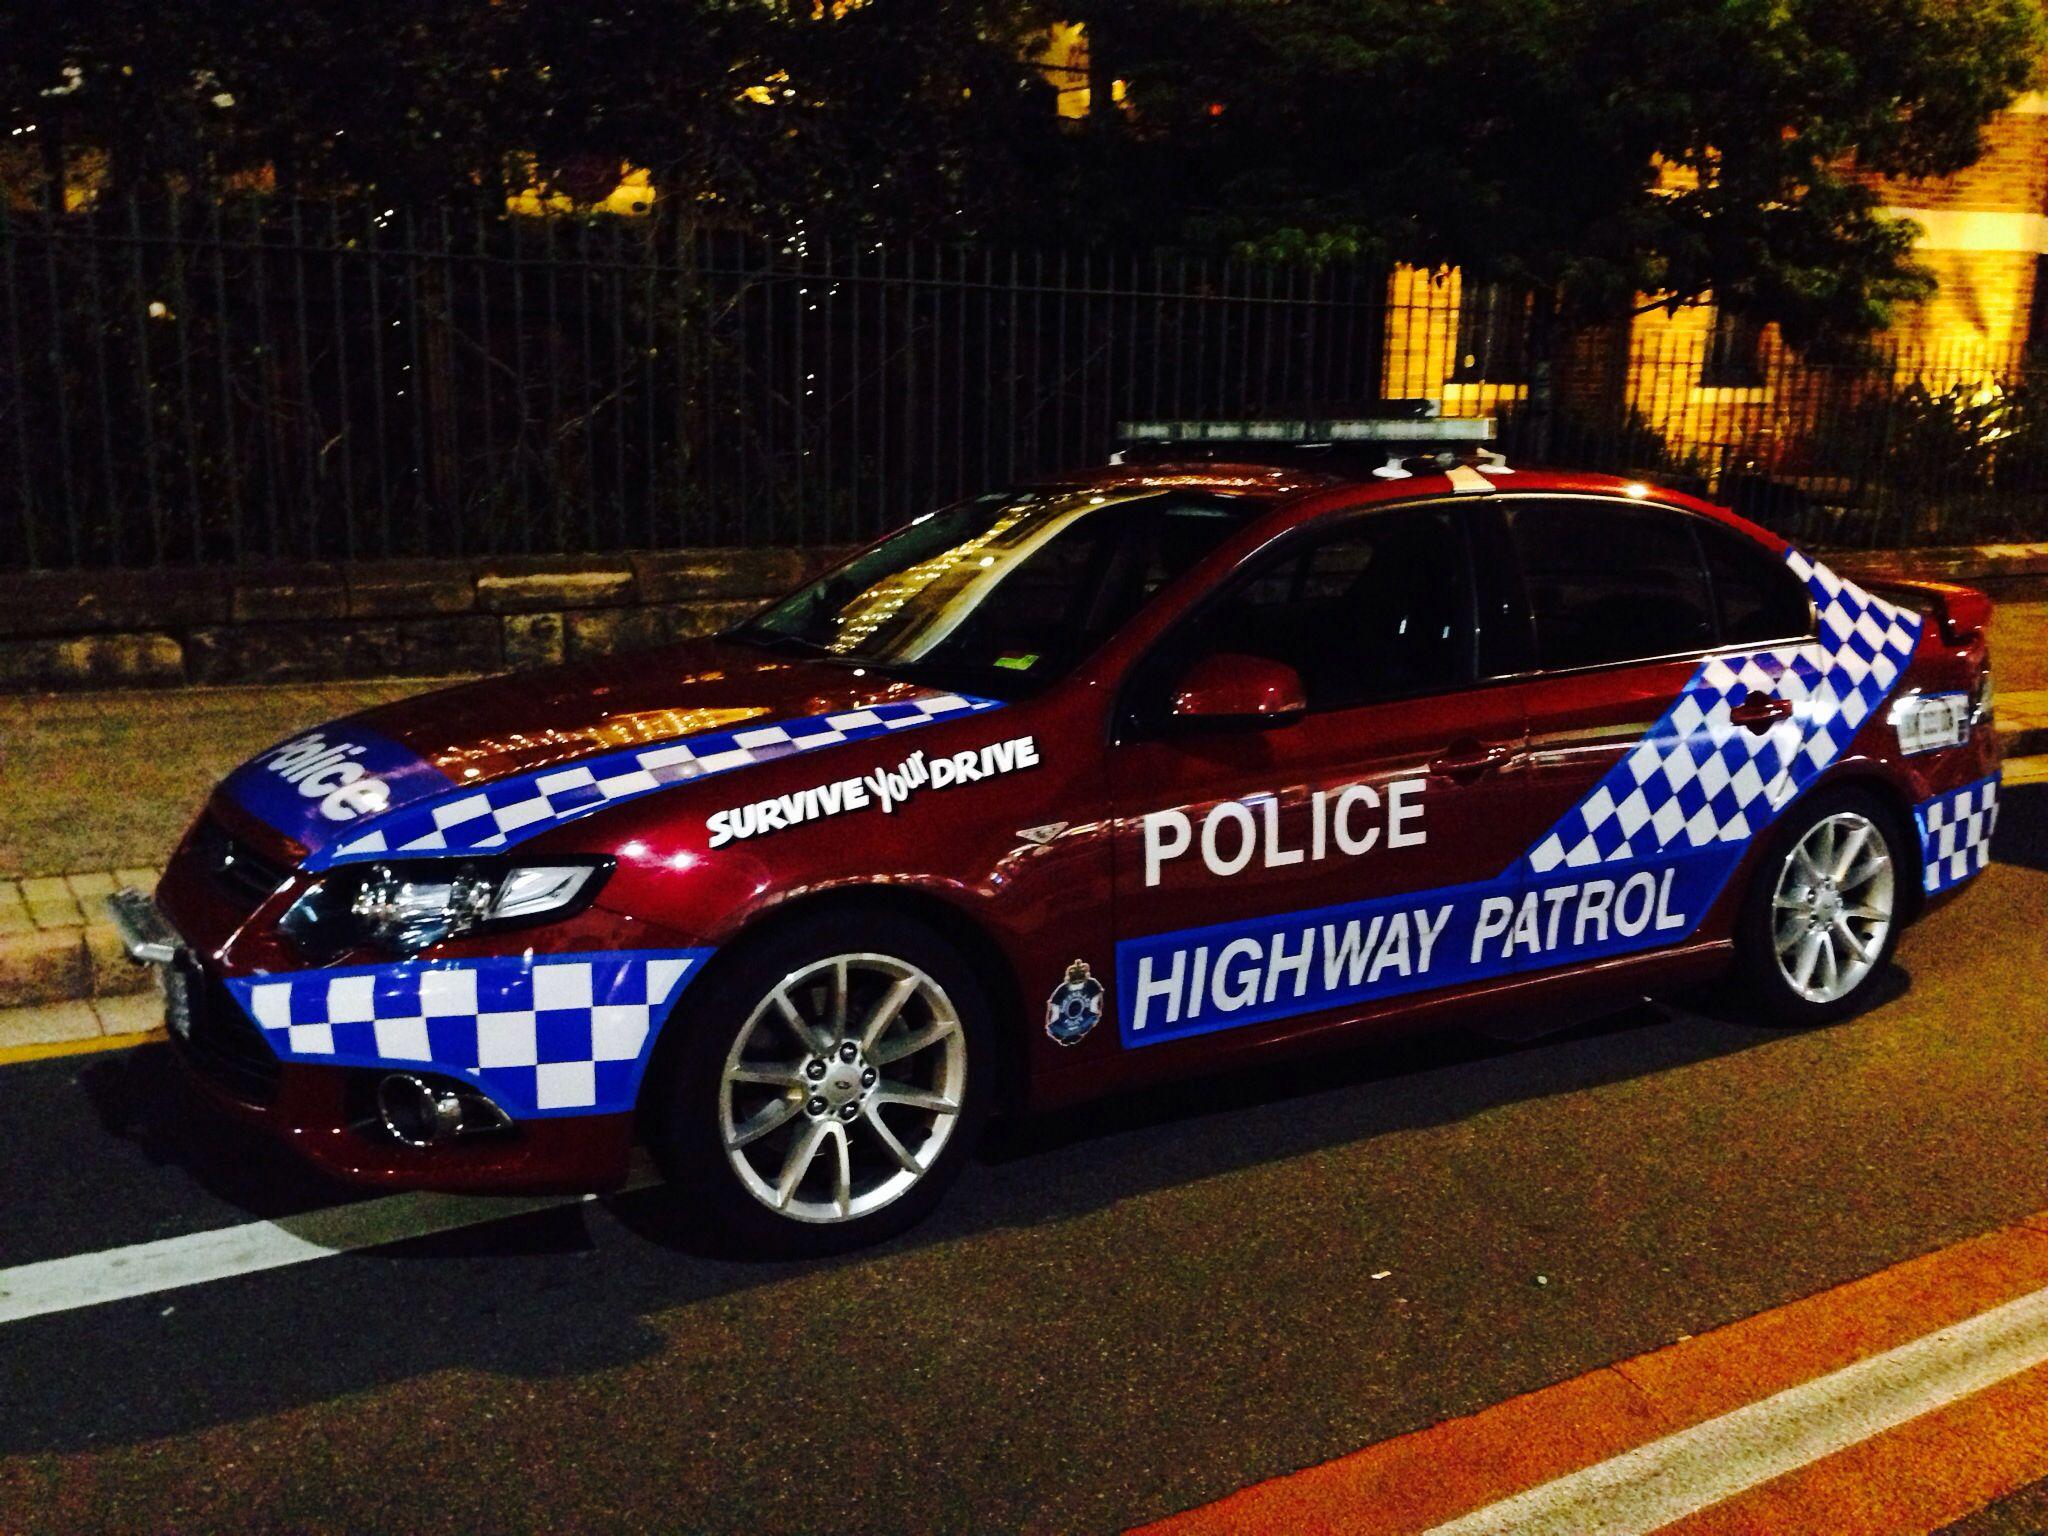 QLD police highway patrol FG Falcon. Australia | Police Car Graphics ...